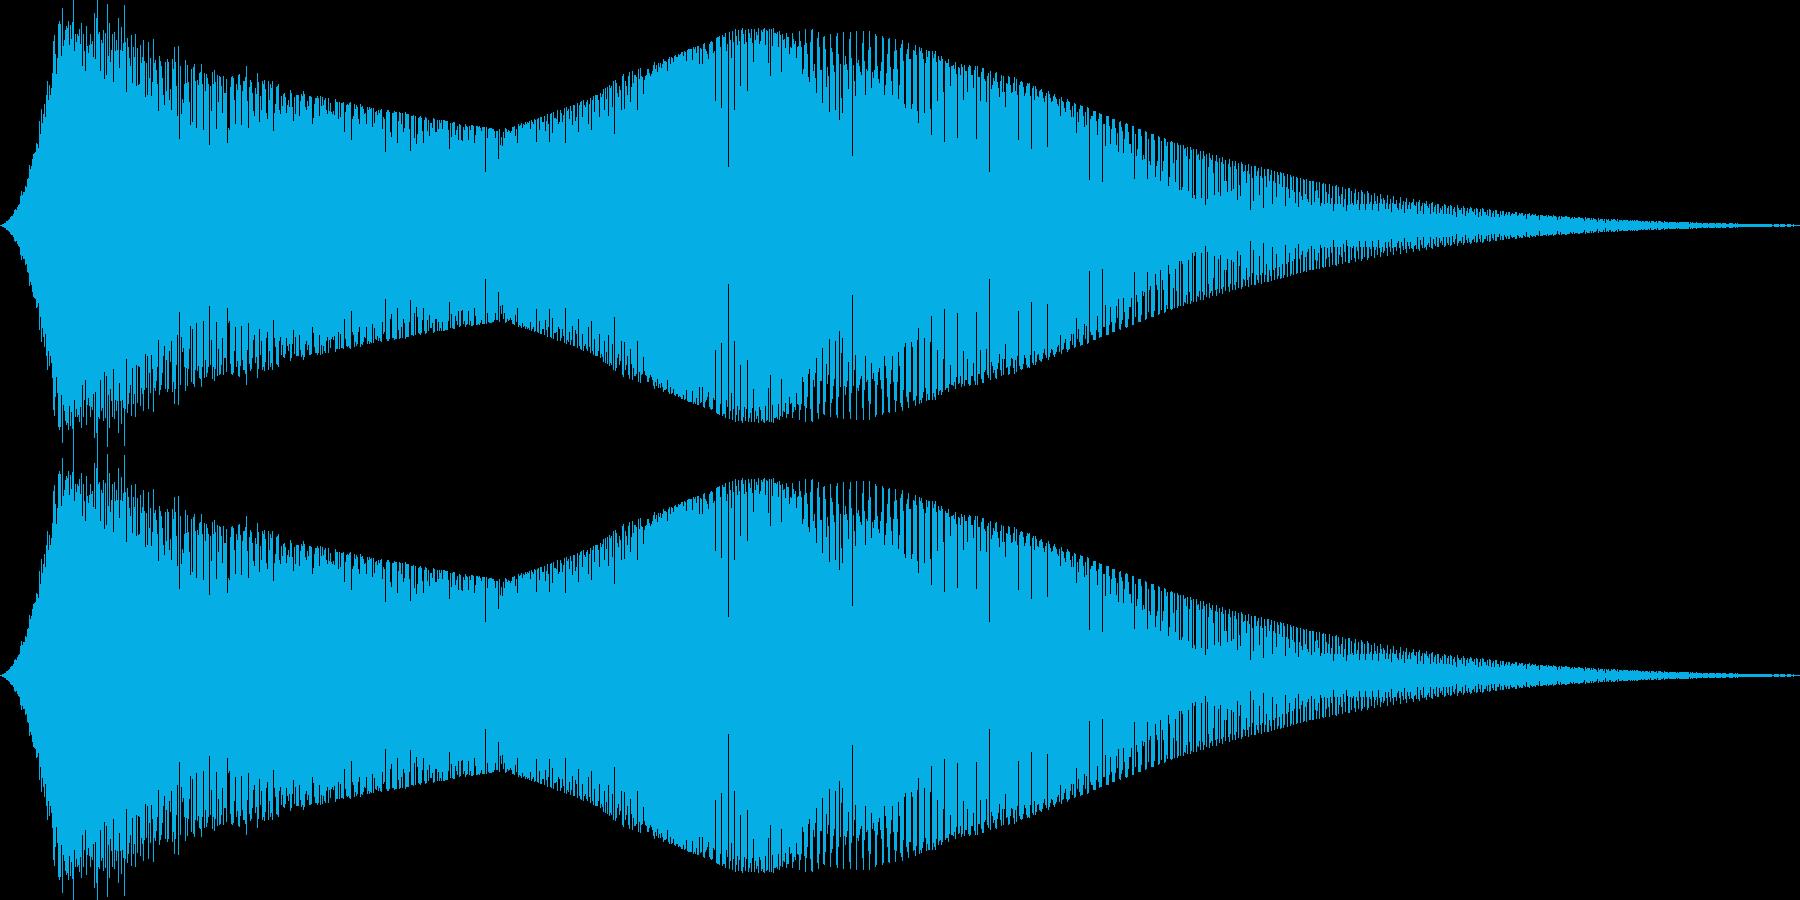 FM音源で作ったサウンドロゴ(ギュワー)の再生済みの波形